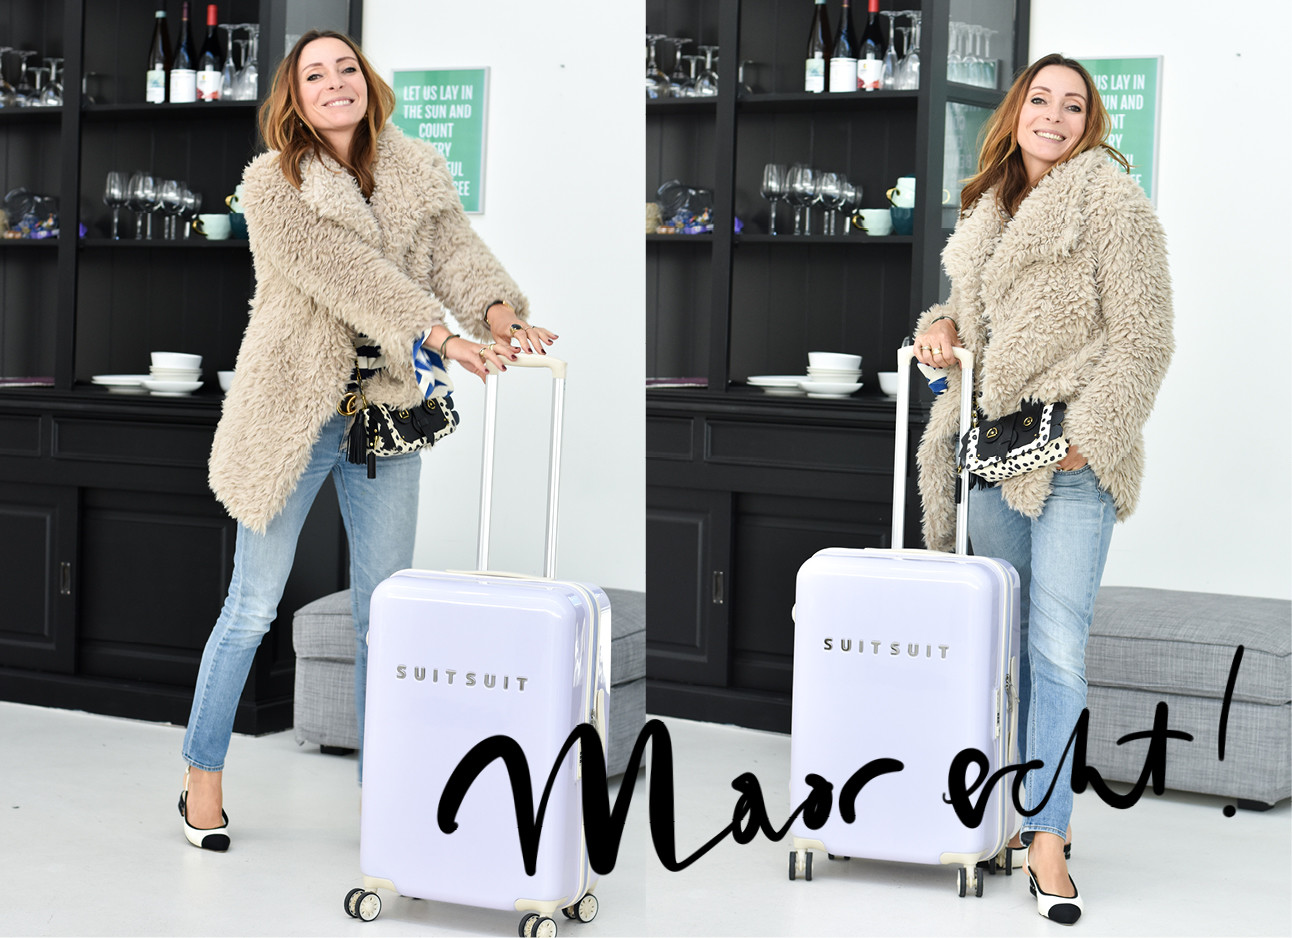 may-britt mobach draagt een bontjas en jeans, en loopt met een suitsuit koffer